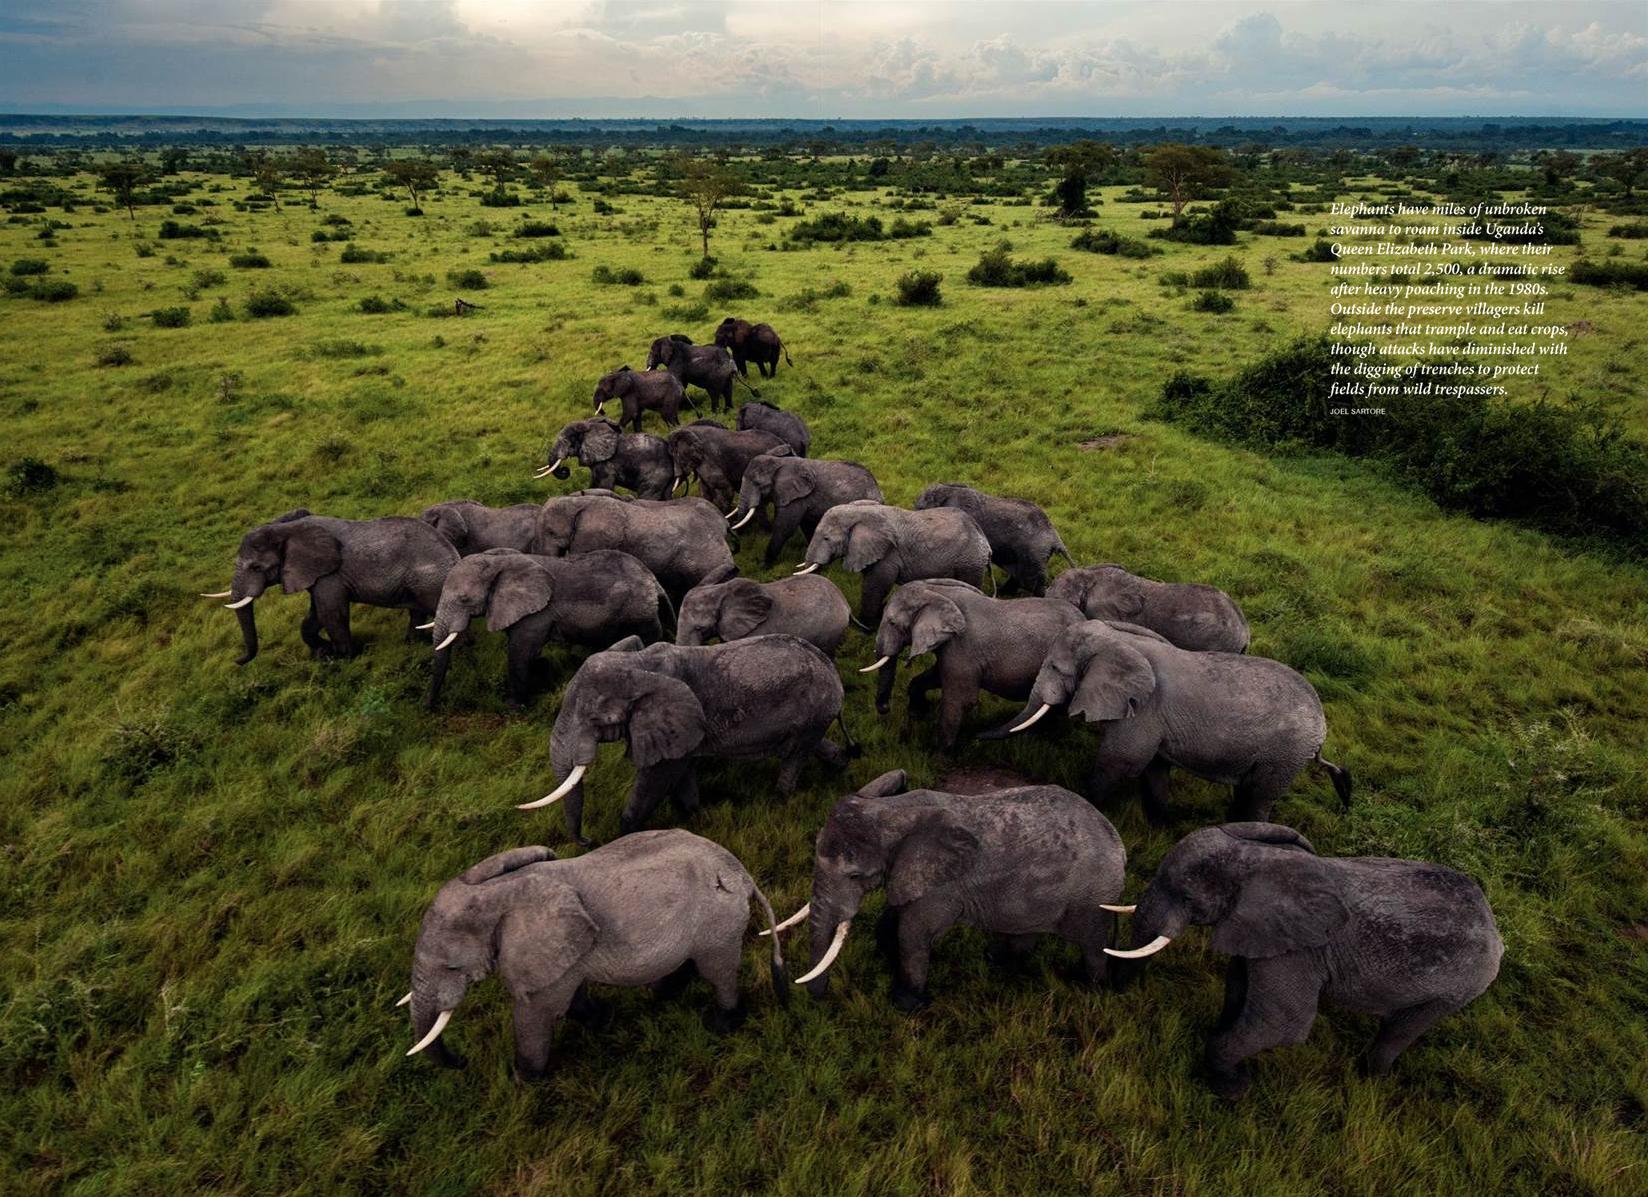 National Geographic,  November 2011,Photo by Joel Sartore